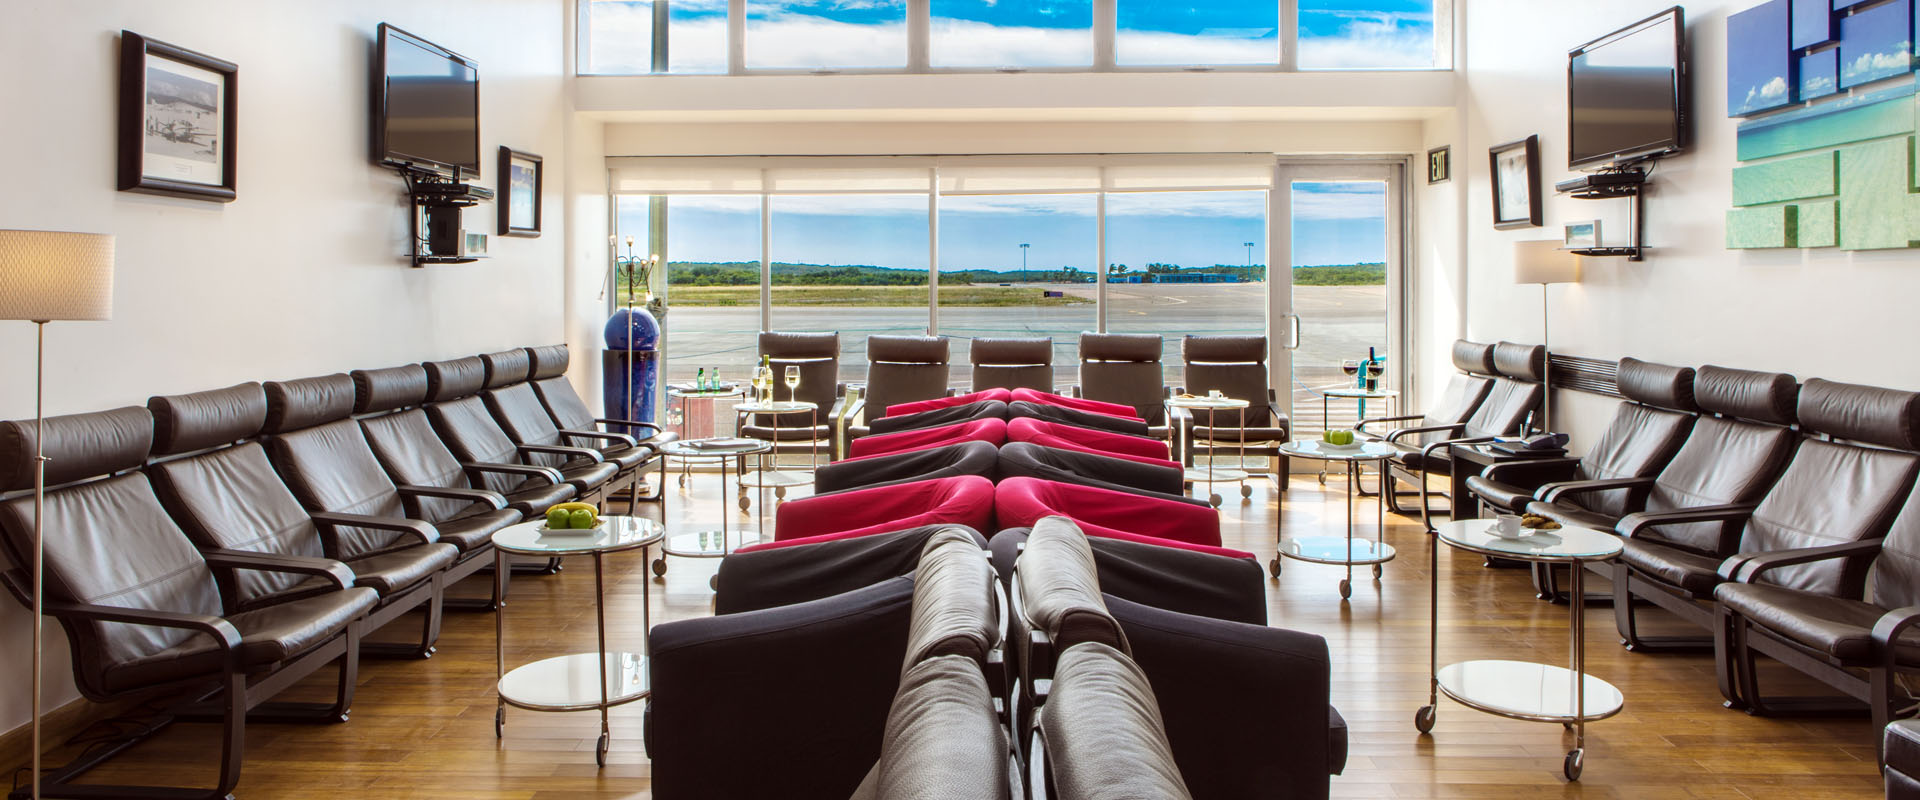 vip-lounge-2